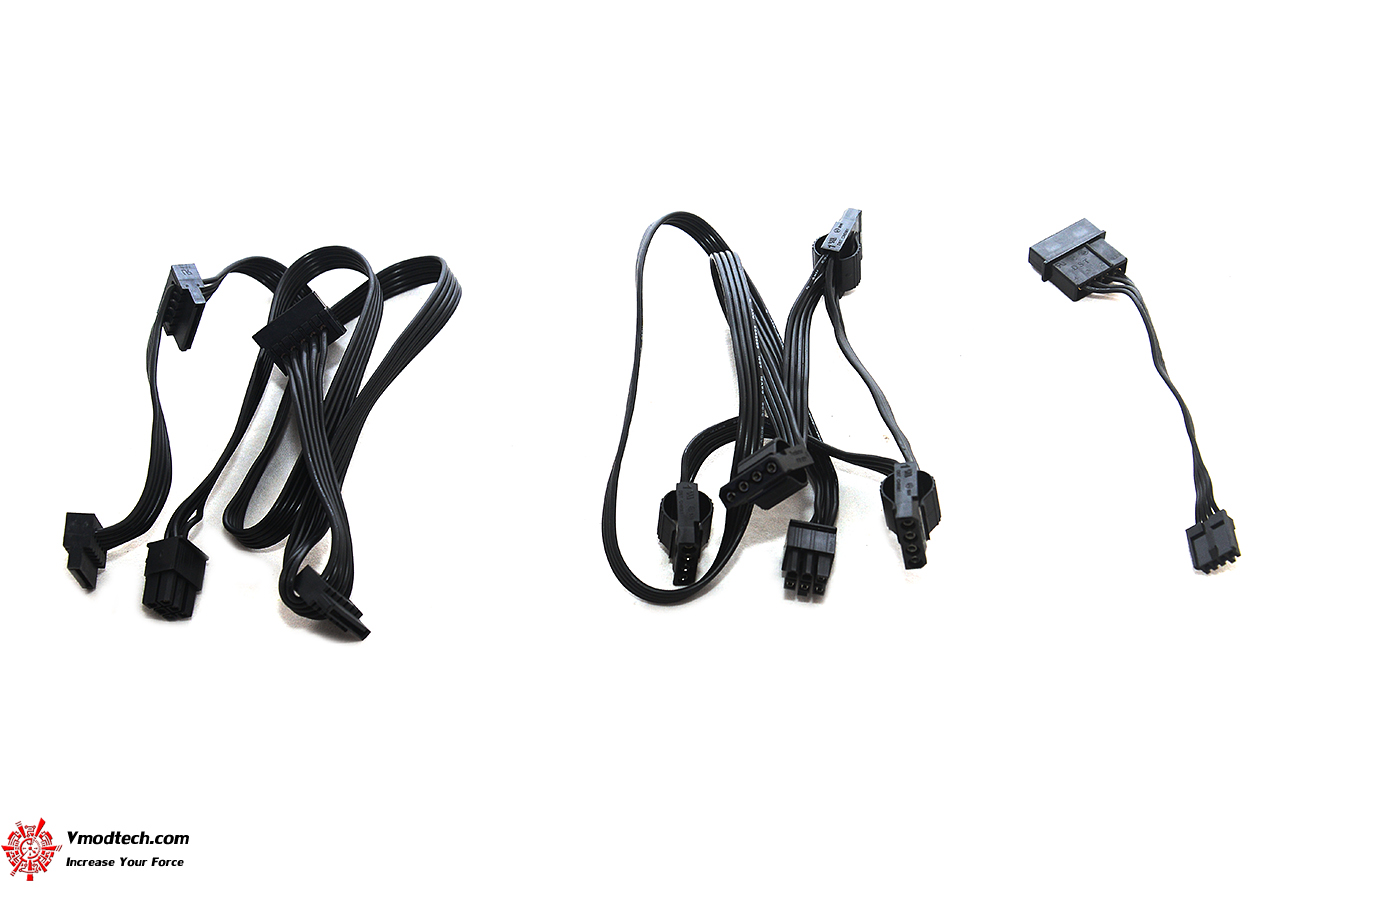 dsc 7003 ENHANCE POWER SUPPLY 1000W EPS 1710 GB1 REVIEW